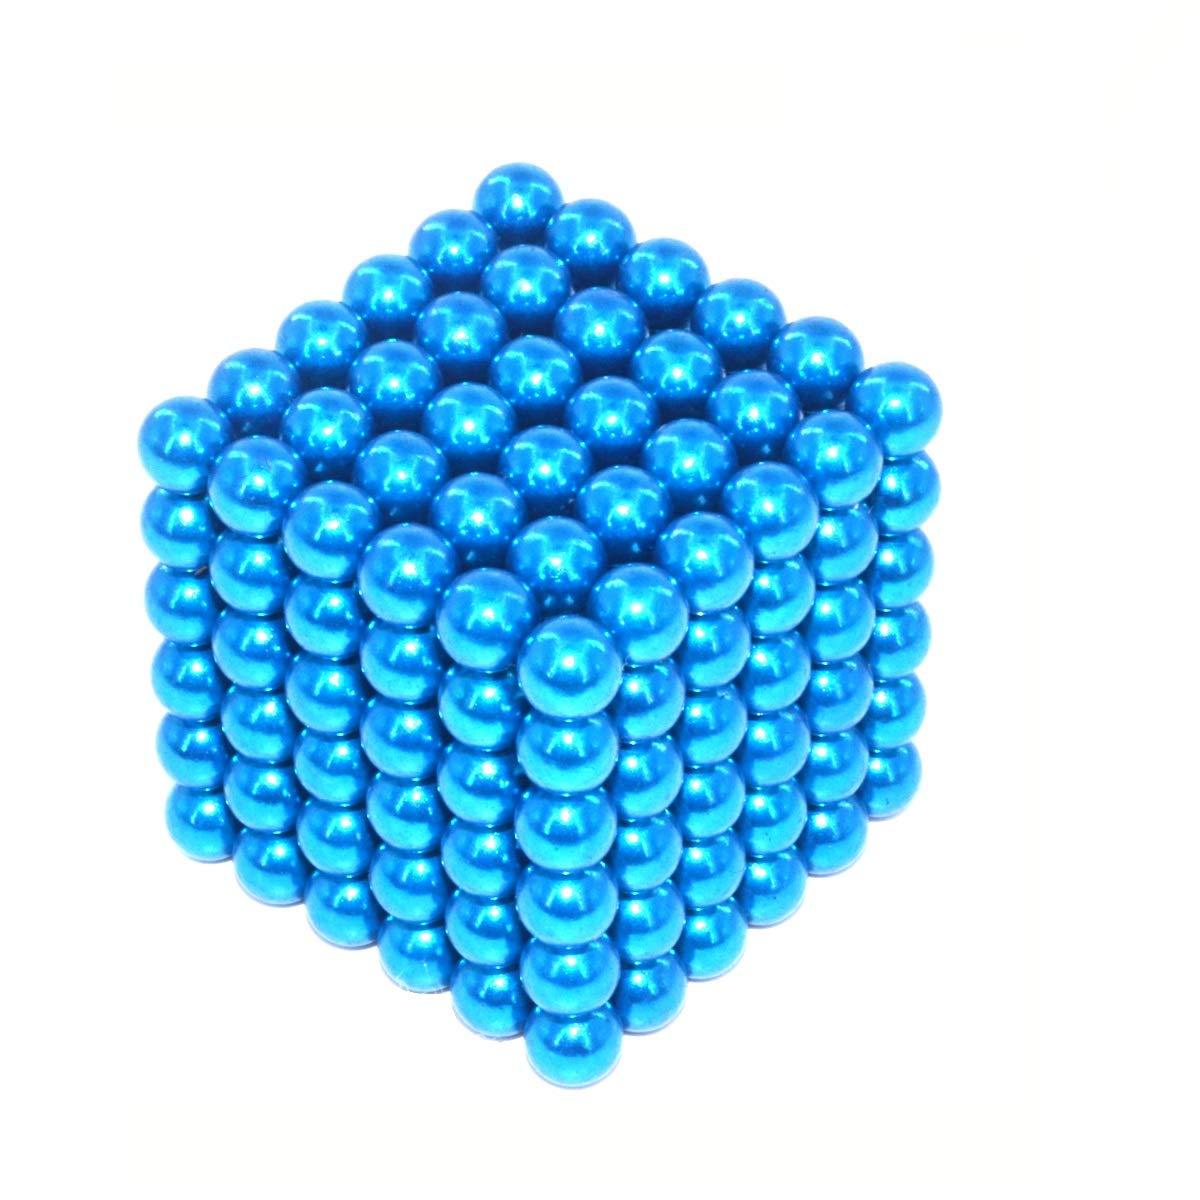 Sculpture toys, Puzzle Magic Cubes, DIY Educational Toys for adultes/Kids (Multi) Elsatsang